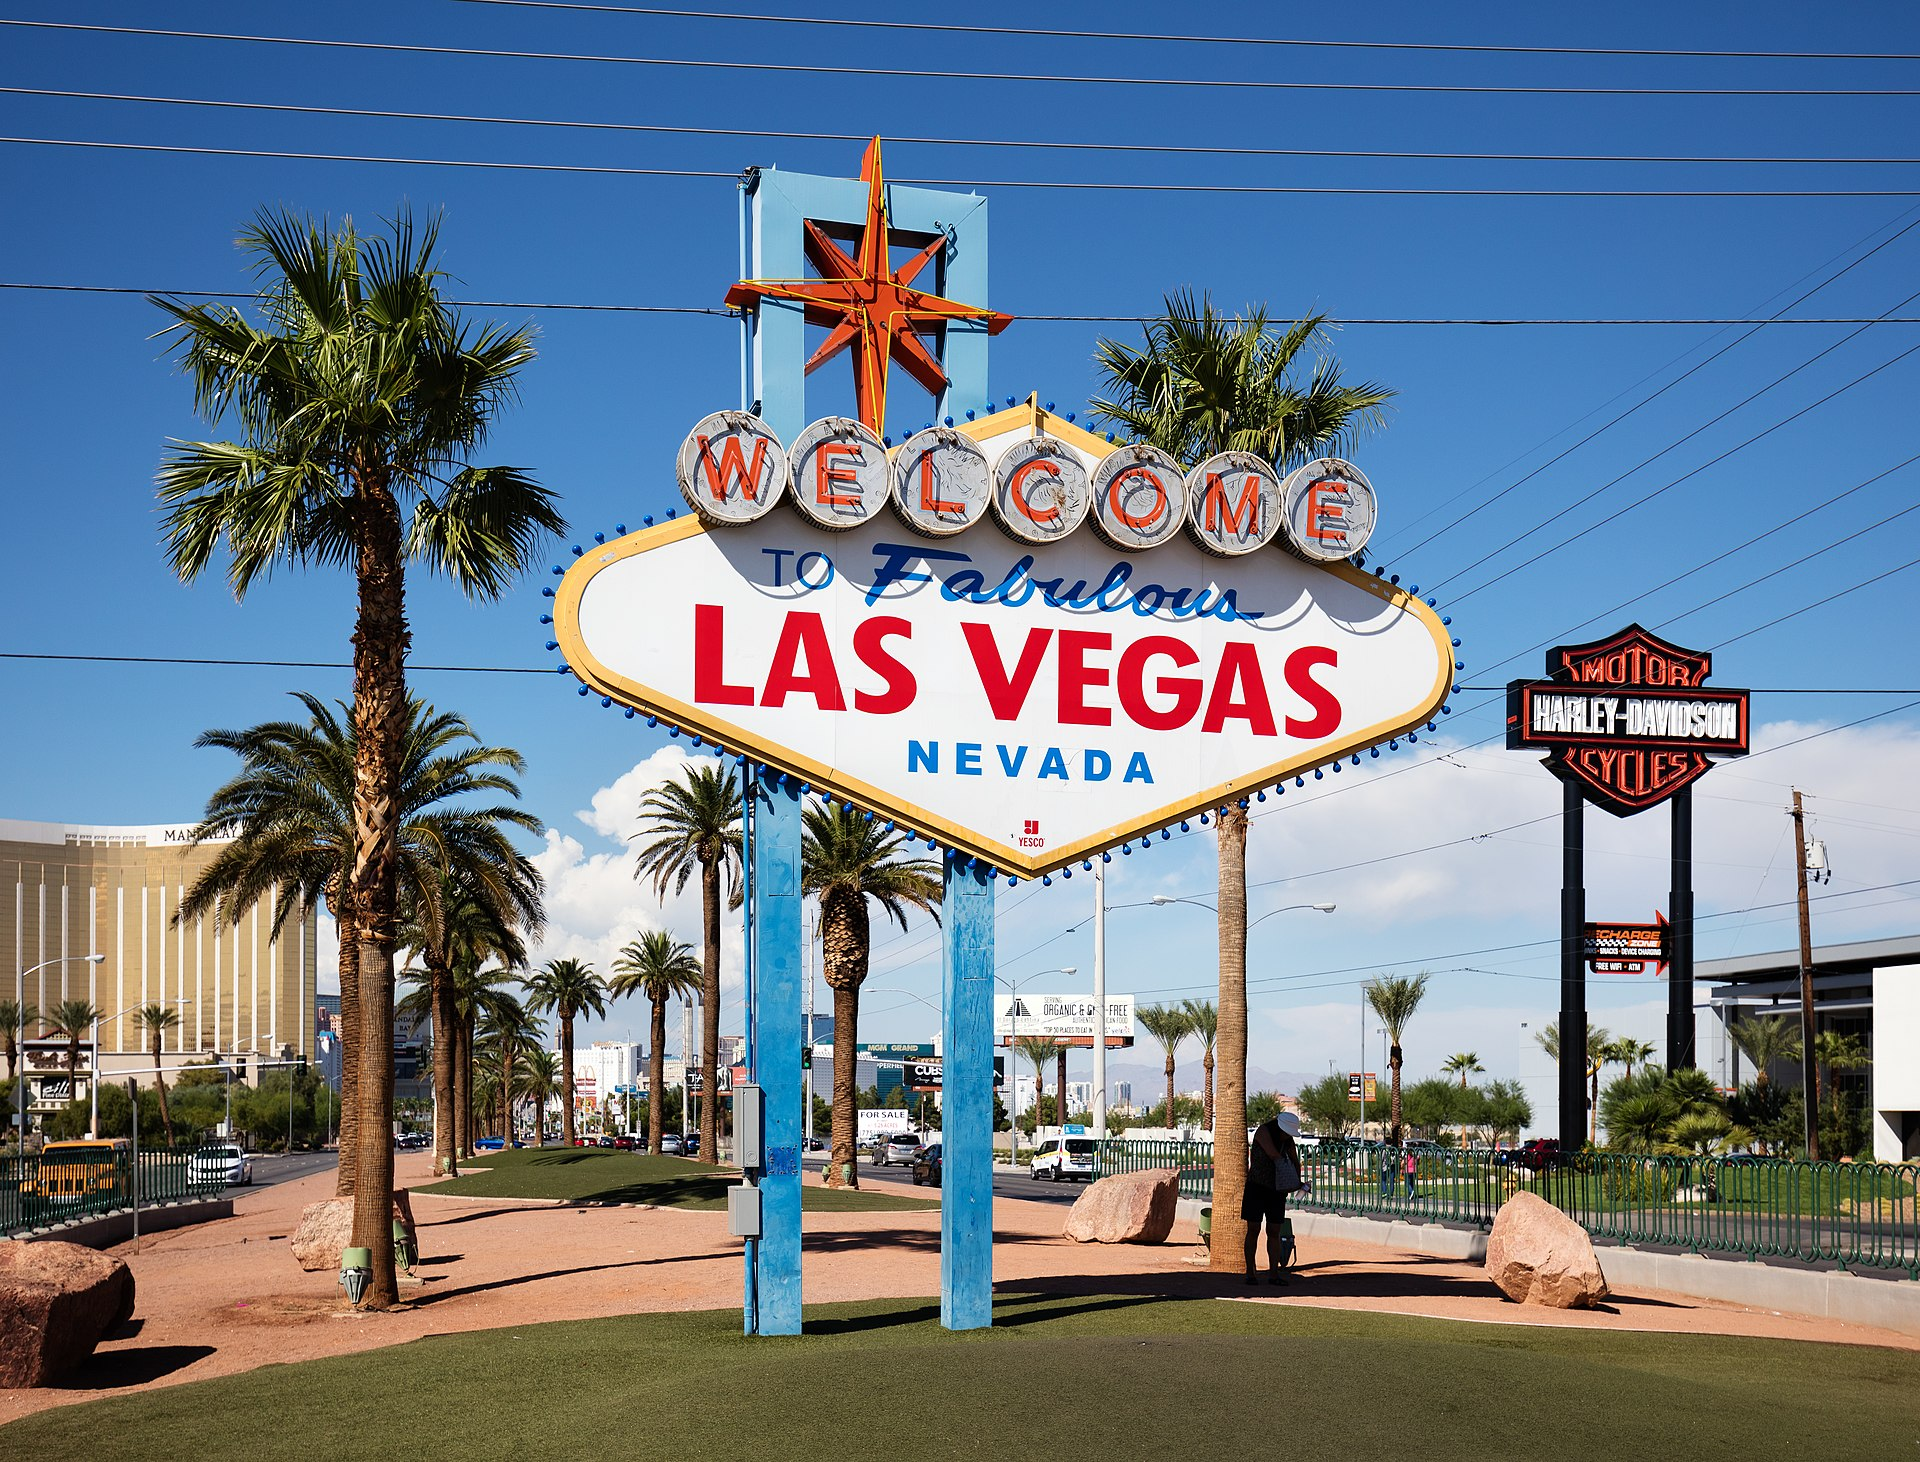 Welcome to Fabulous Las Vegas sign - Wikipedia